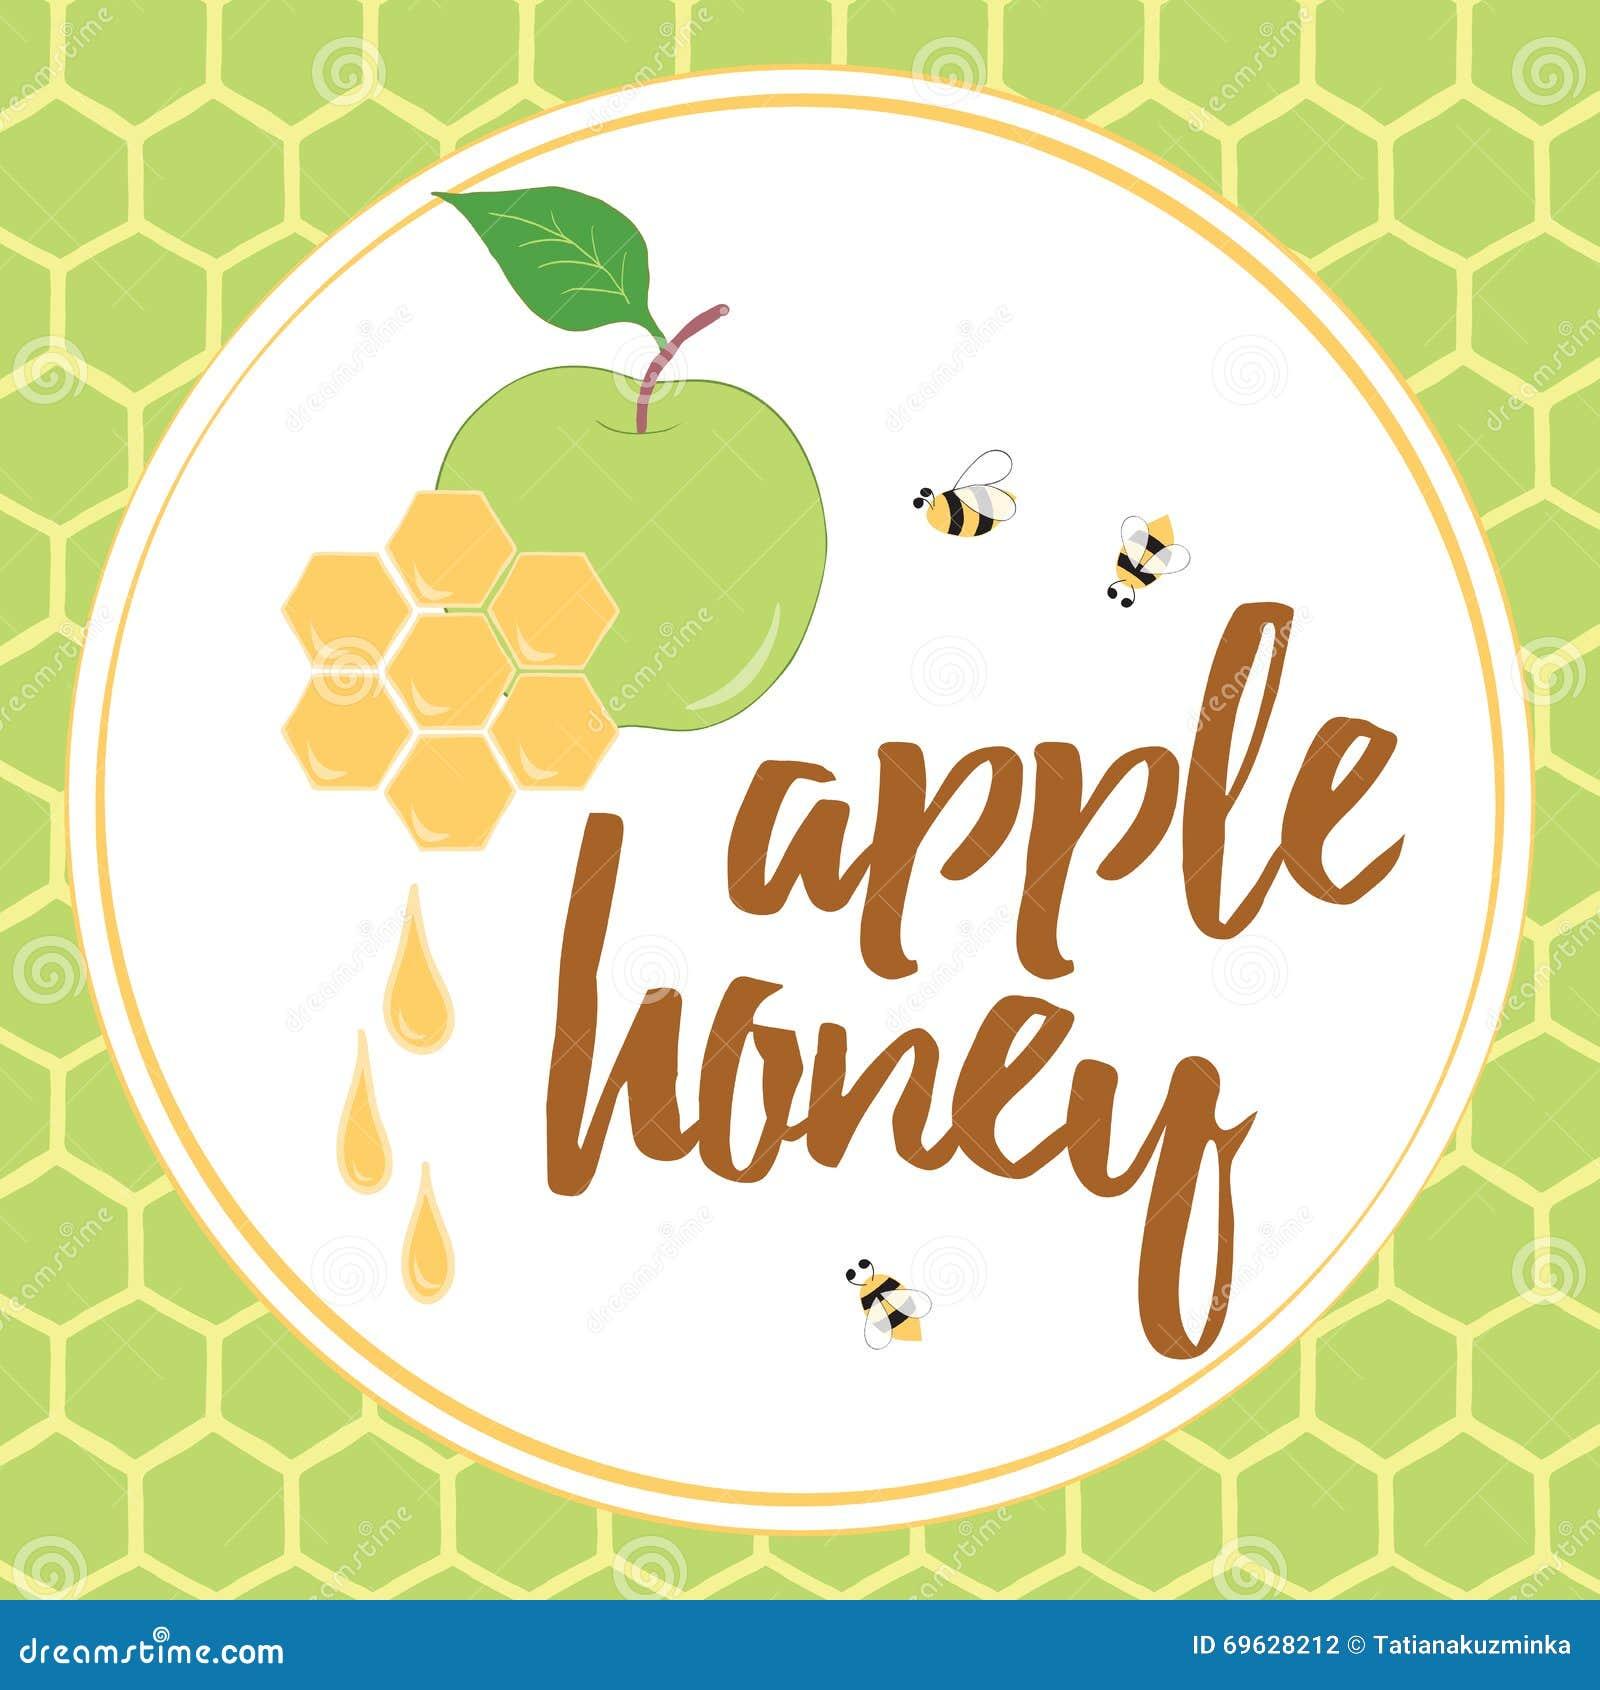 apple and honey jewish new year symbols vector illustration